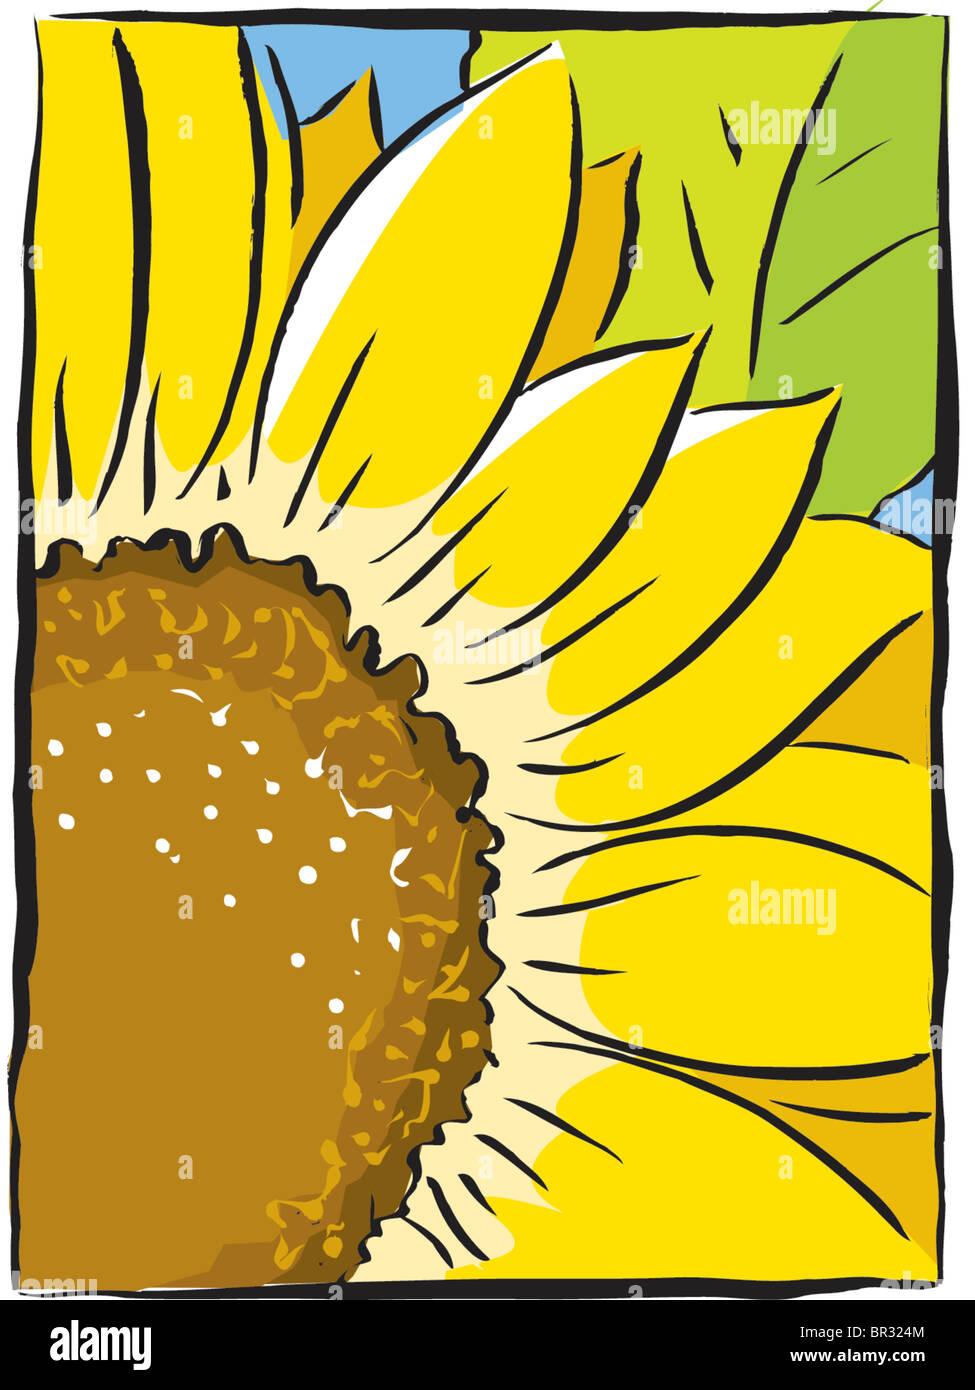 sunflower close-up - Stock Image